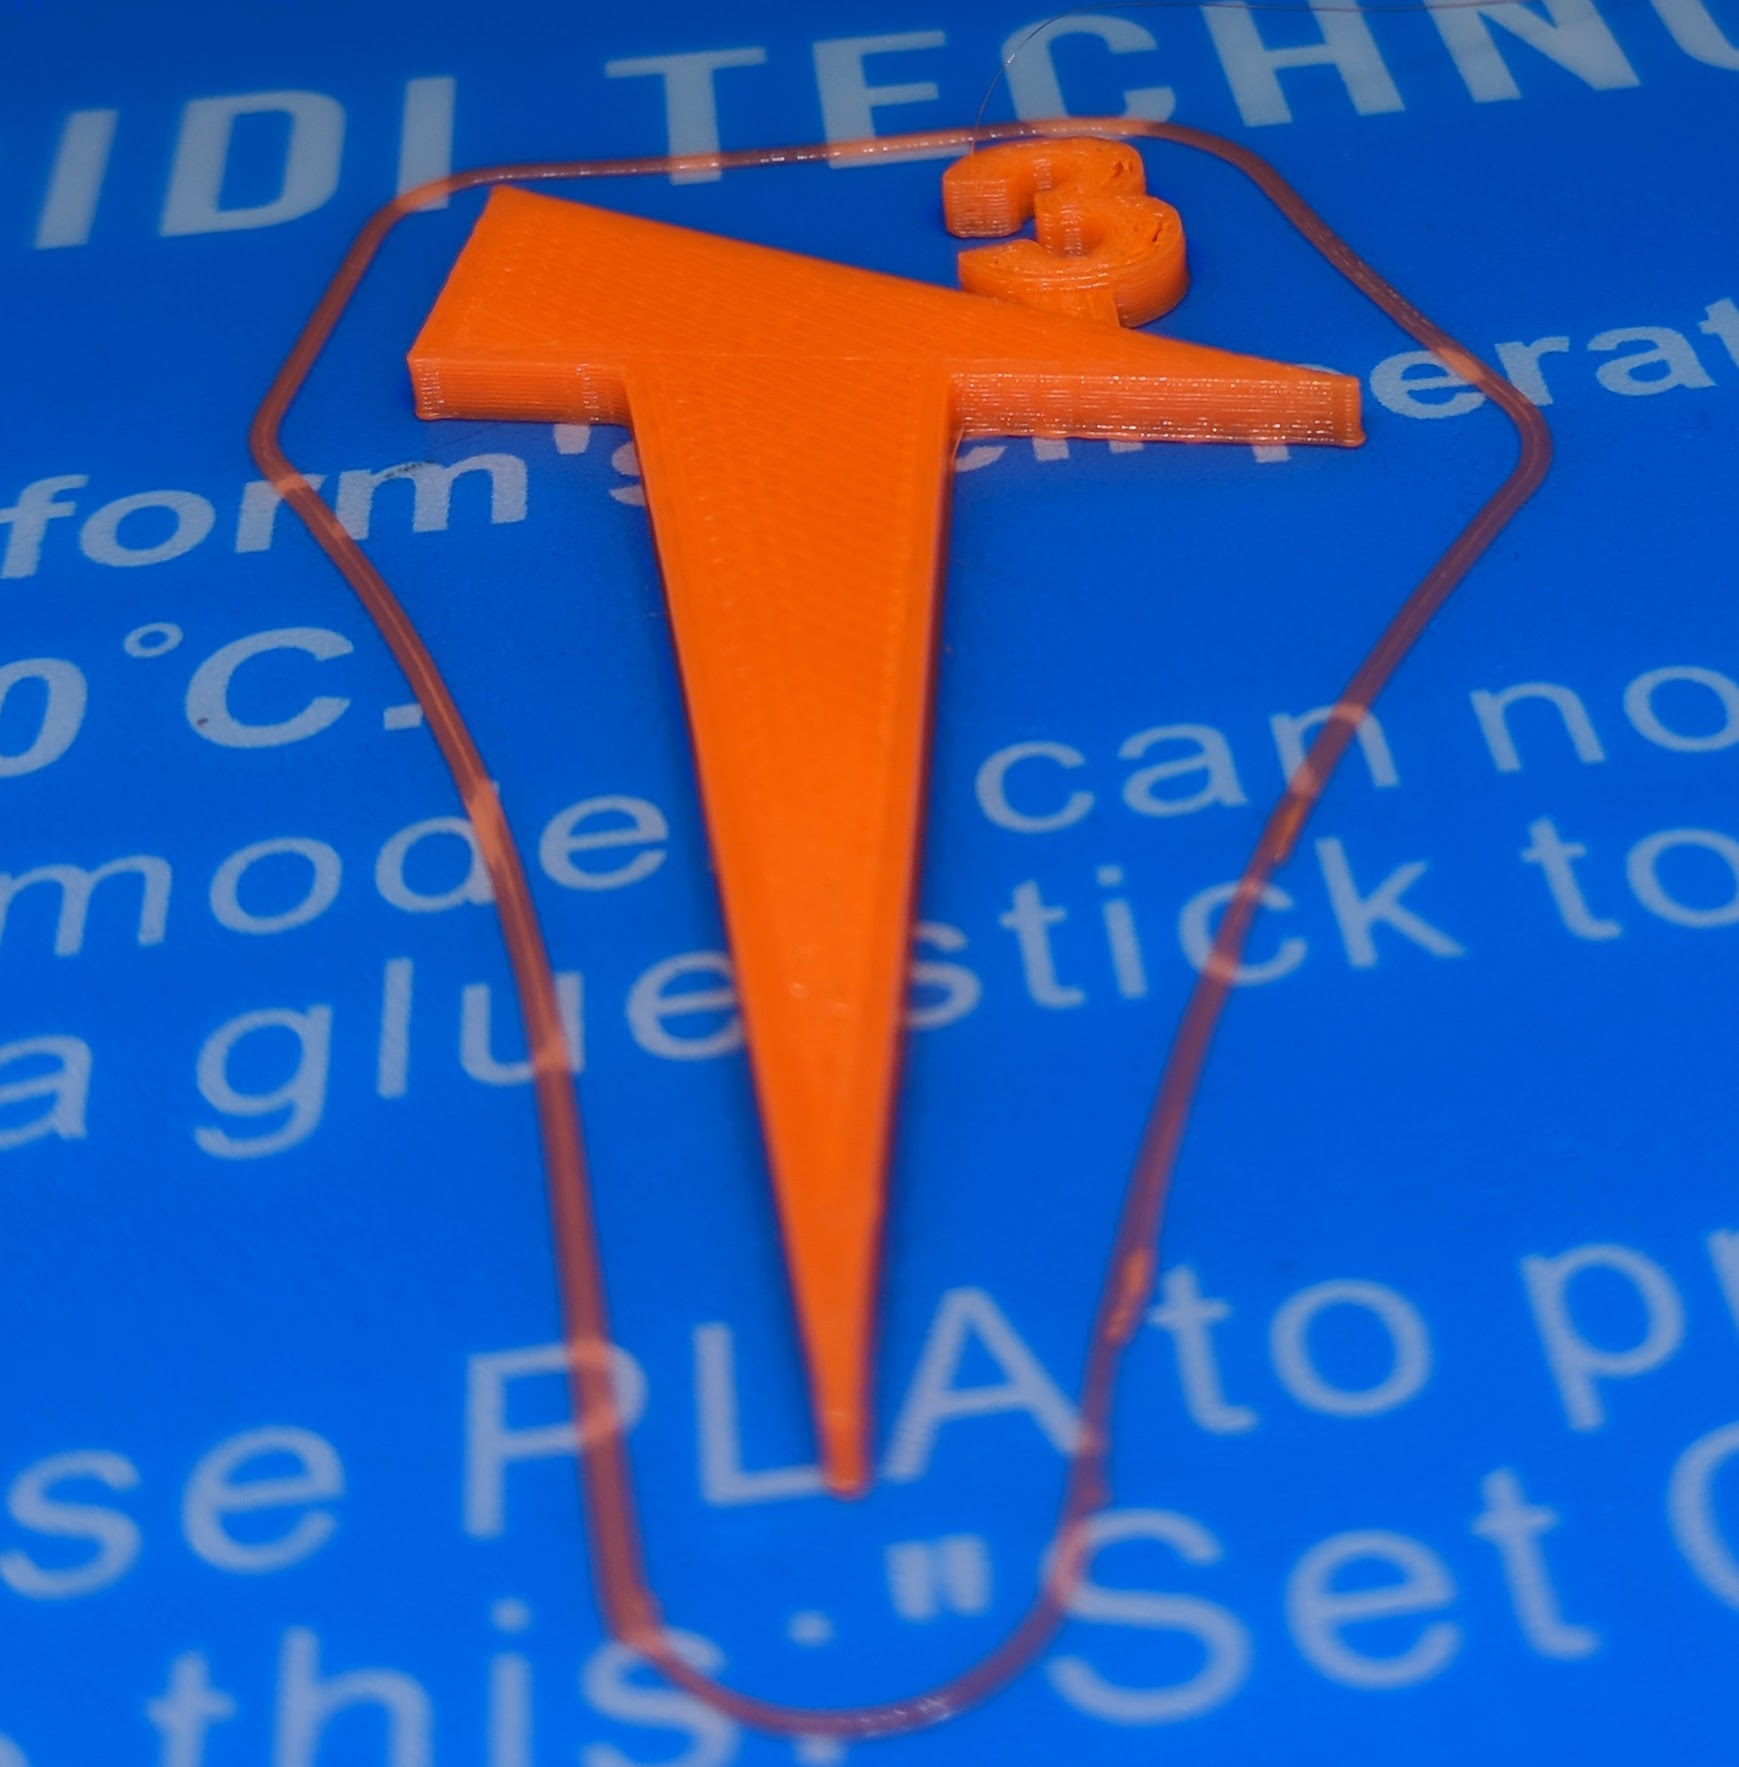 3D Printing: QIDI 3D Printer + Software Setup